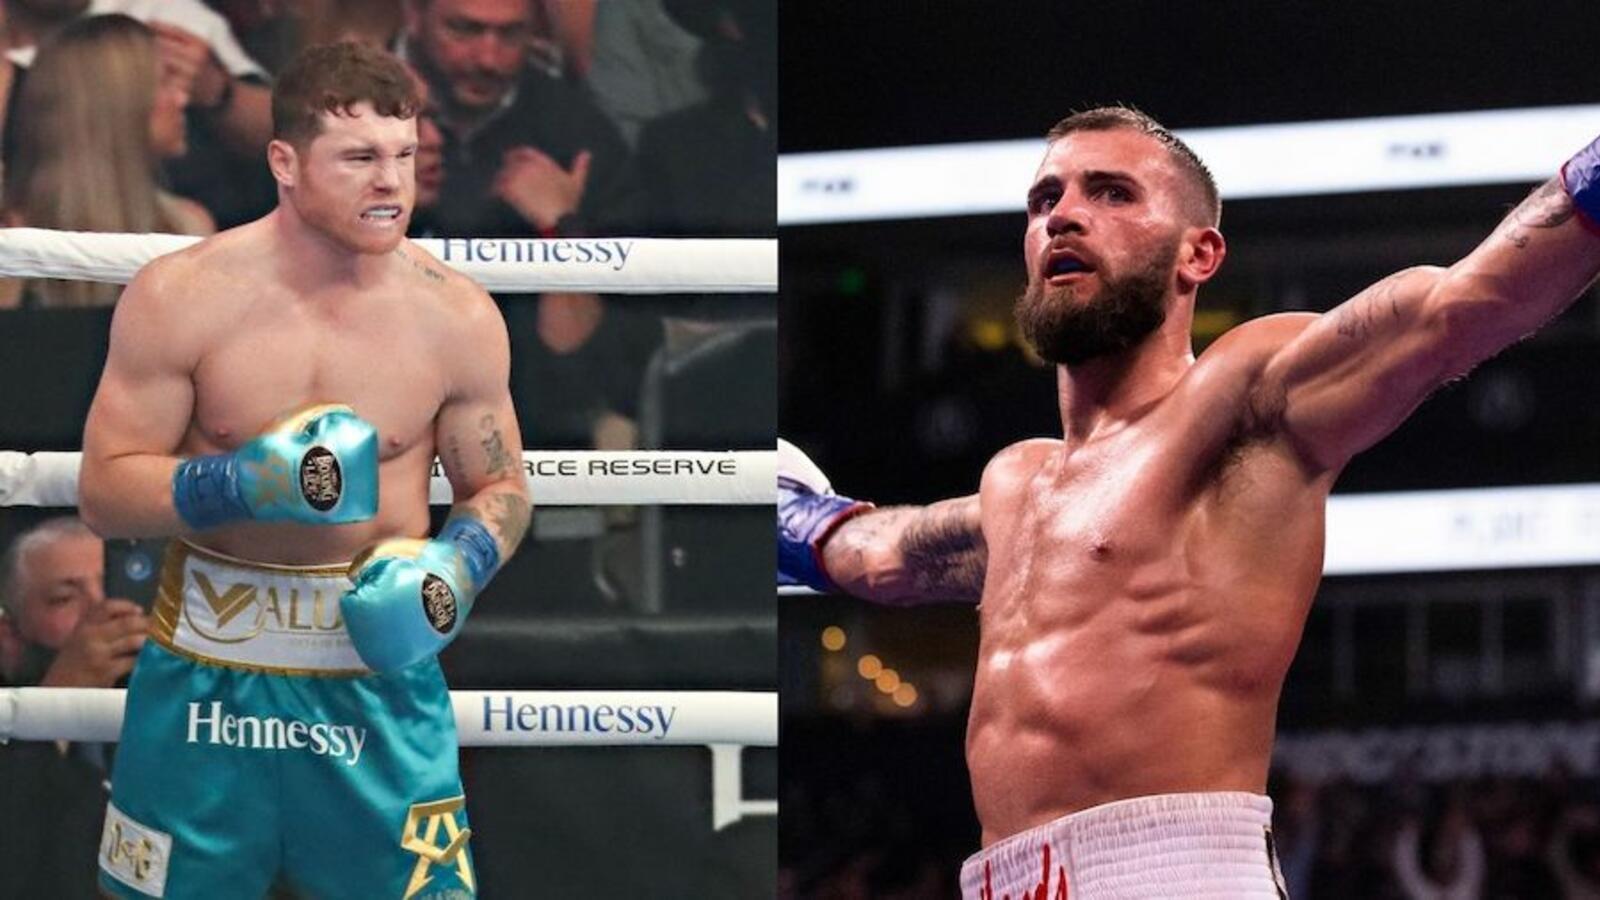 WATCH: Canelo Alvarez, Caleb Plant Fight At Presser For Boxing Match